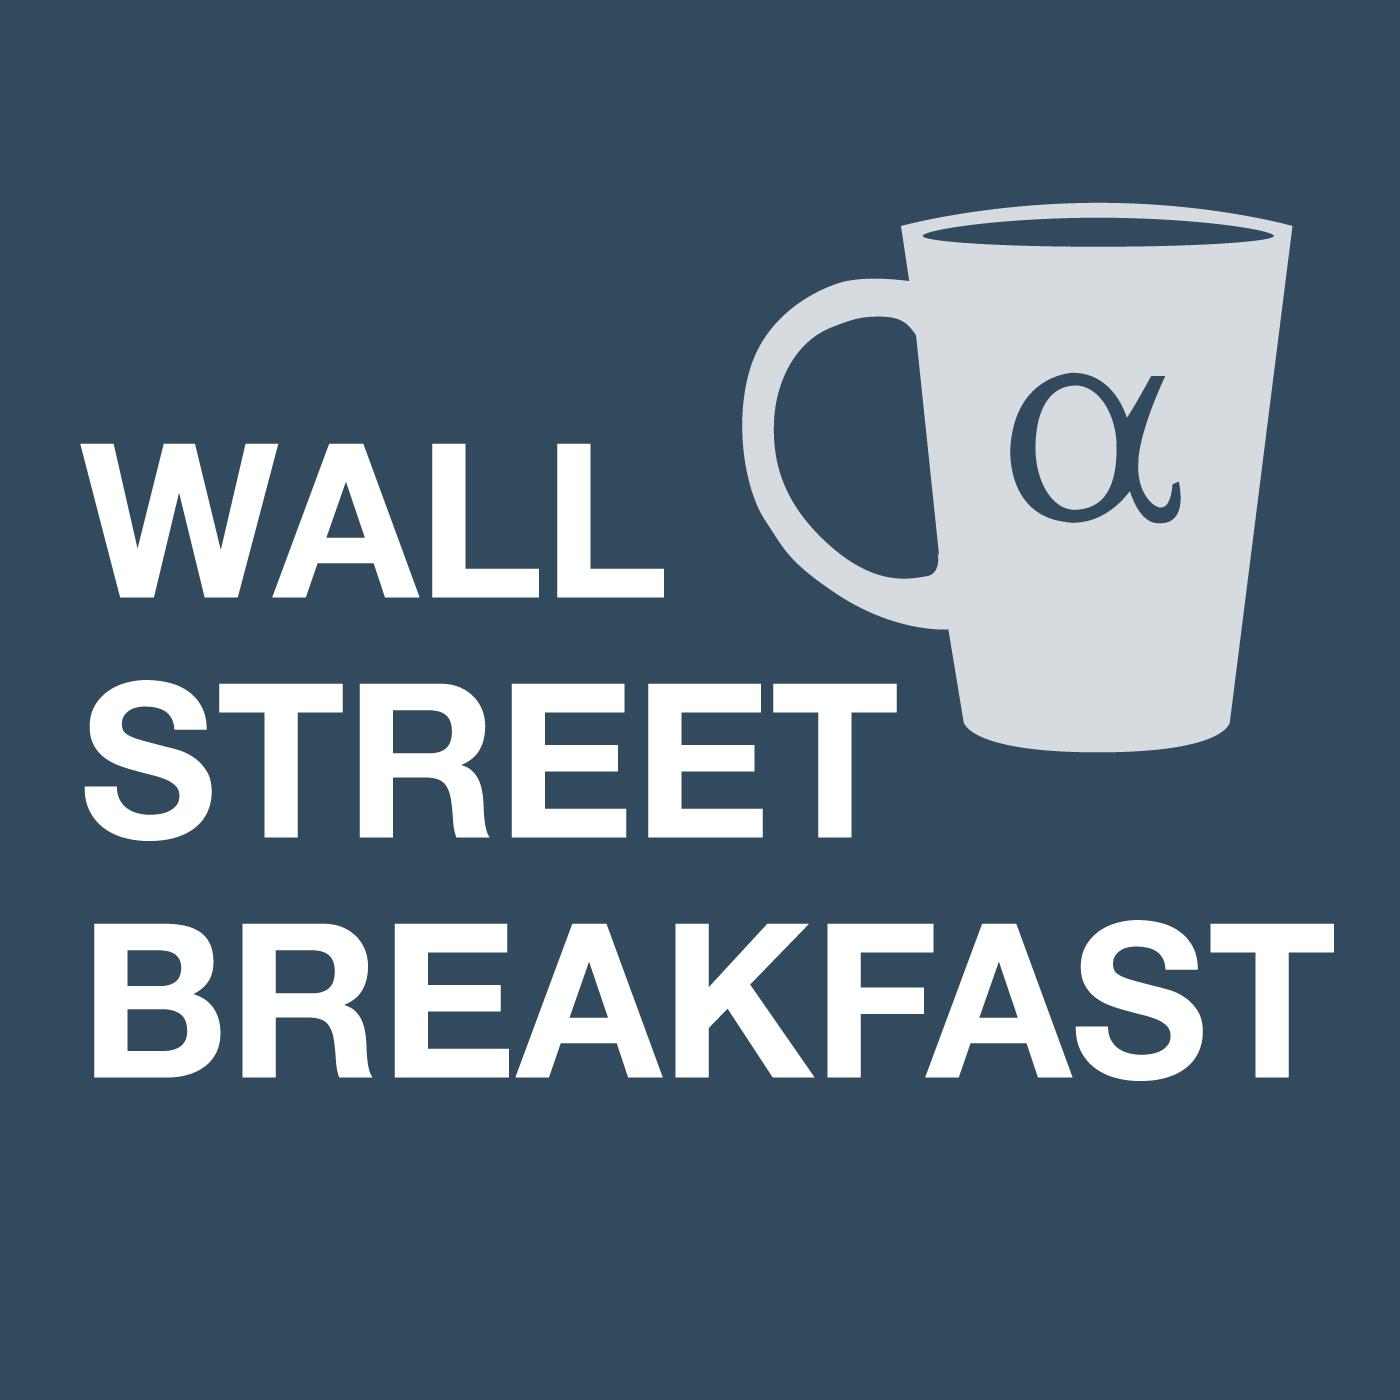 Wall Street Breakfast August 12: The Democratic Ticket Takes Shape